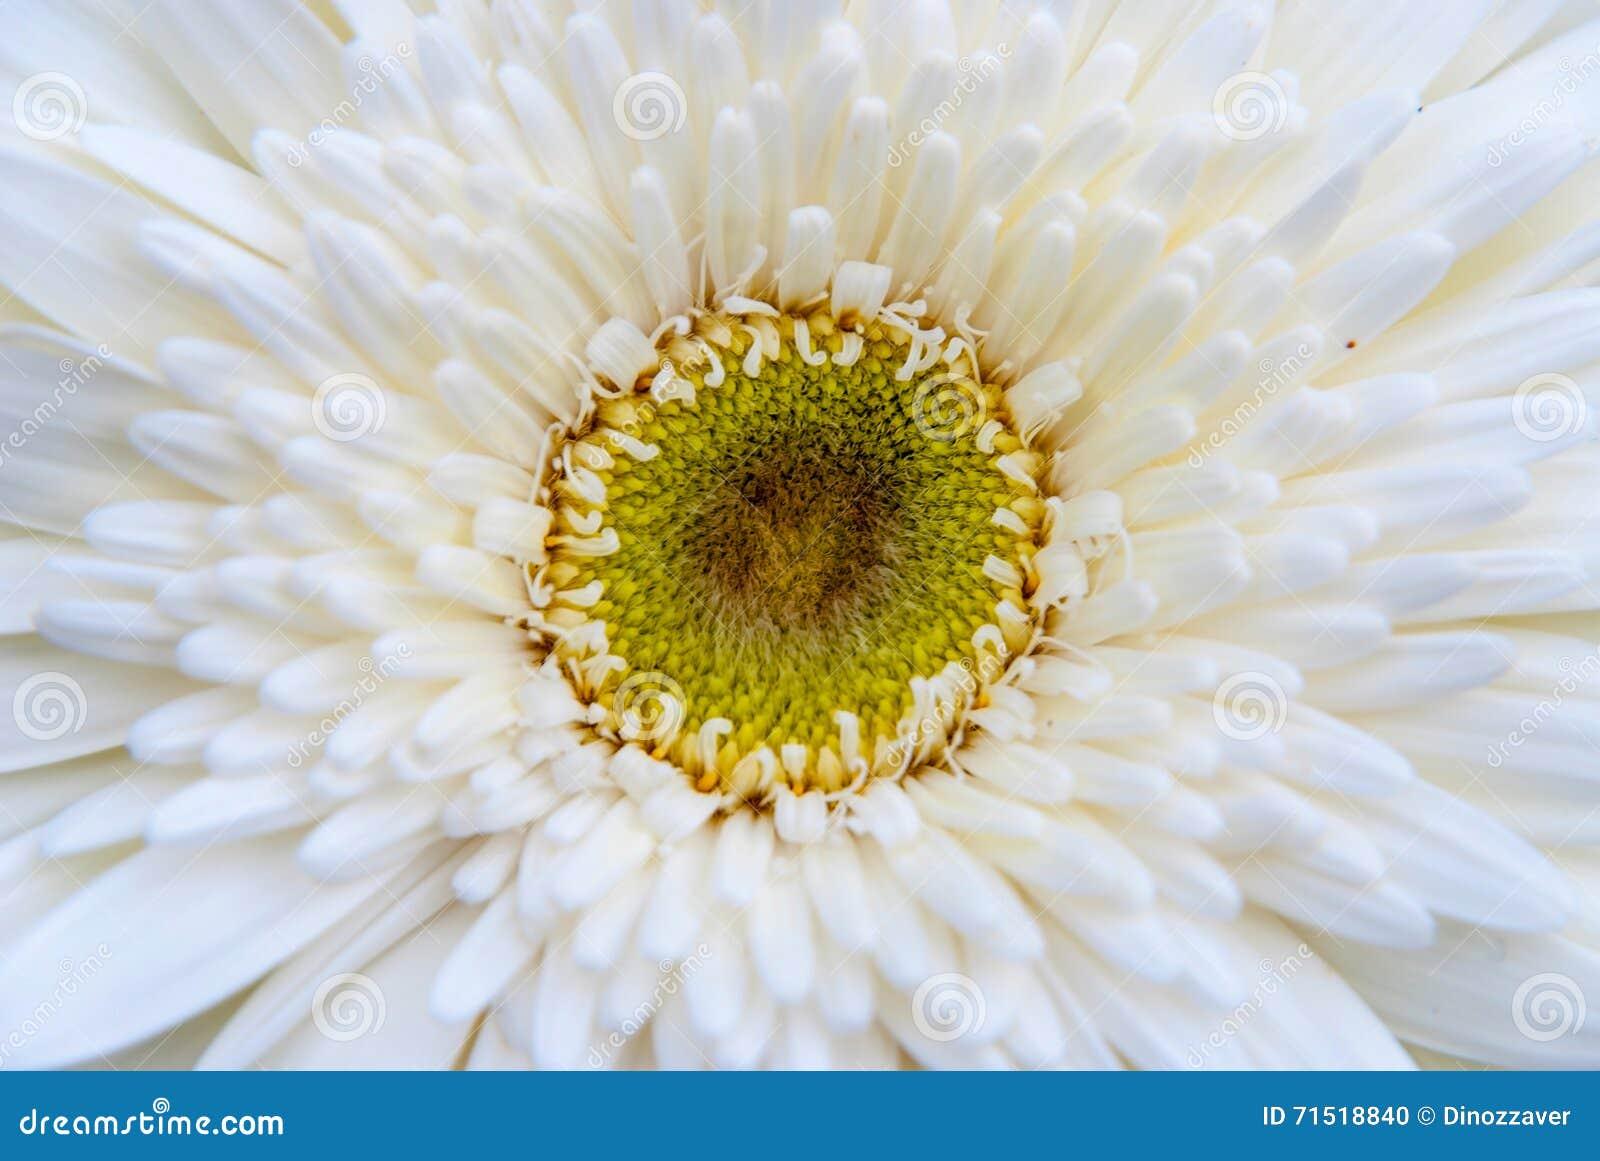 Close Up Of White Gerbera Flower Stock Photo Image Of Daisy